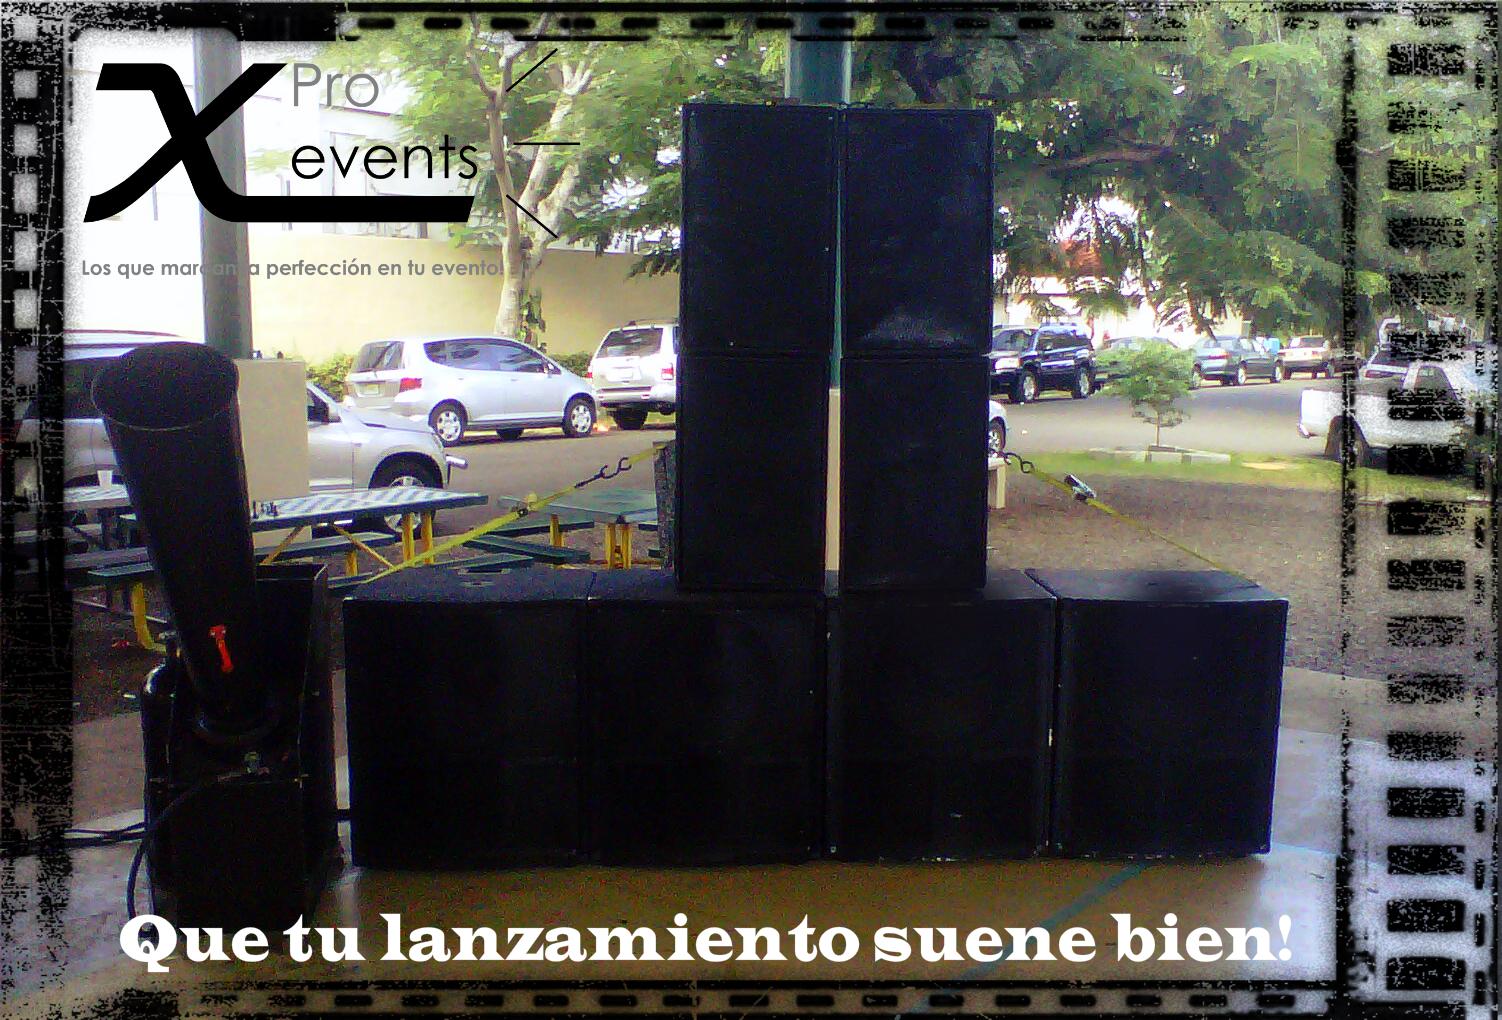 X Pro events  - 809-846-3784 - Potente sonido Yorkville.jpg